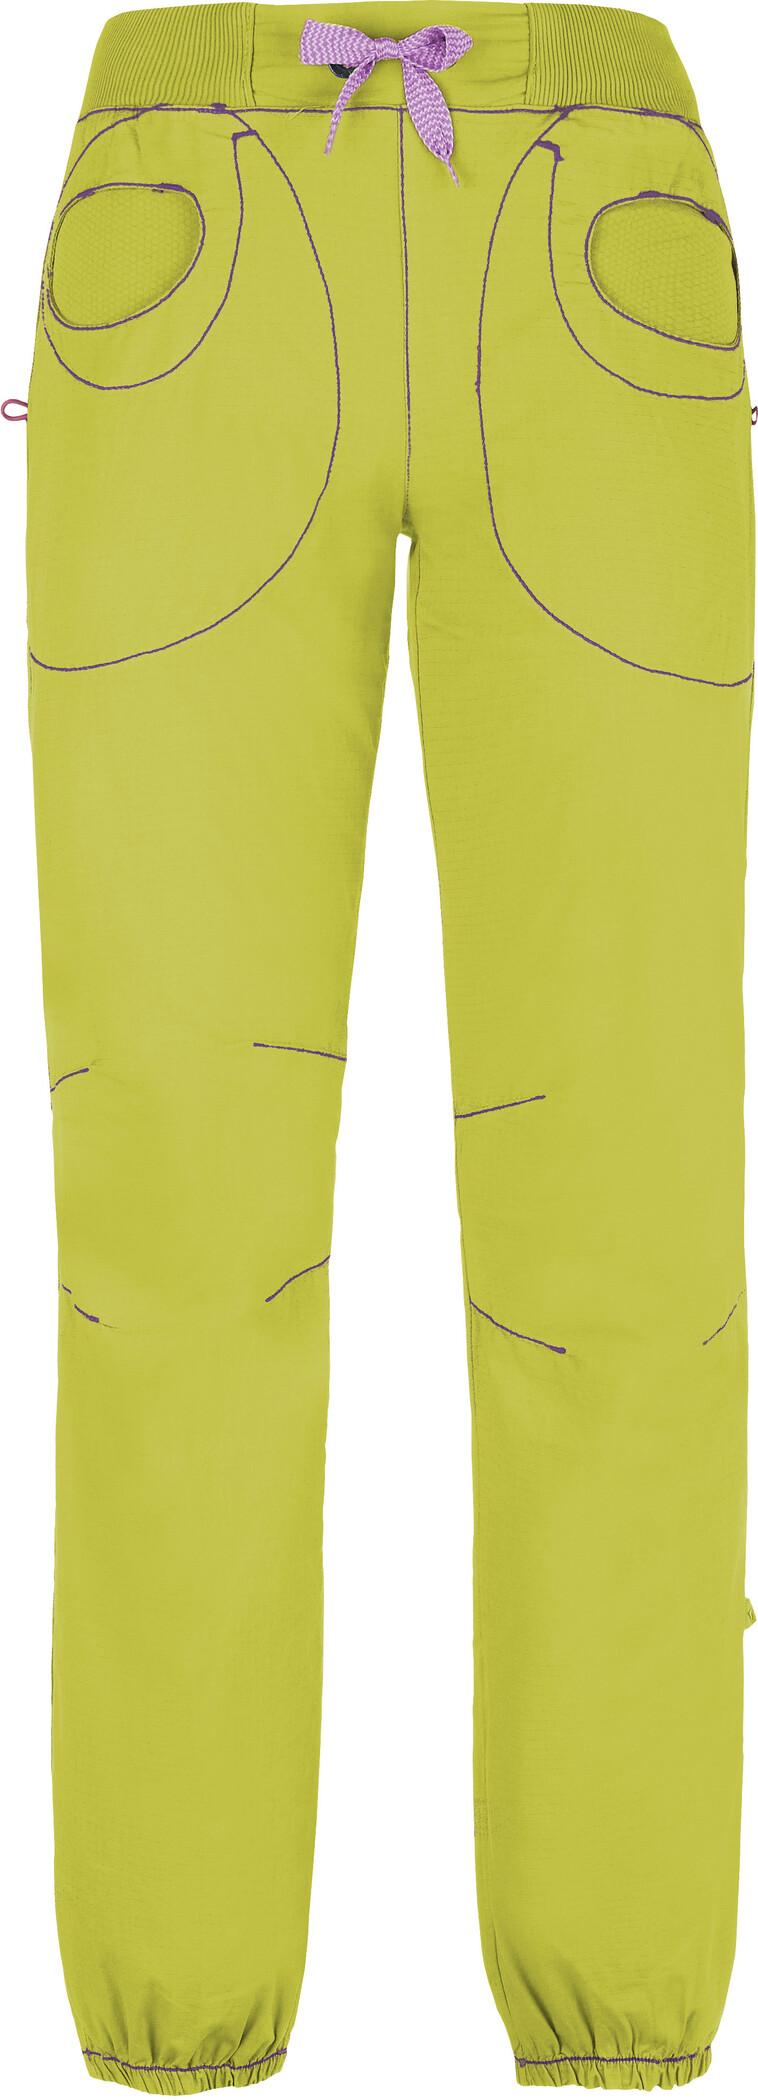 campz.chalchemy 3xdry cotton silk jogger